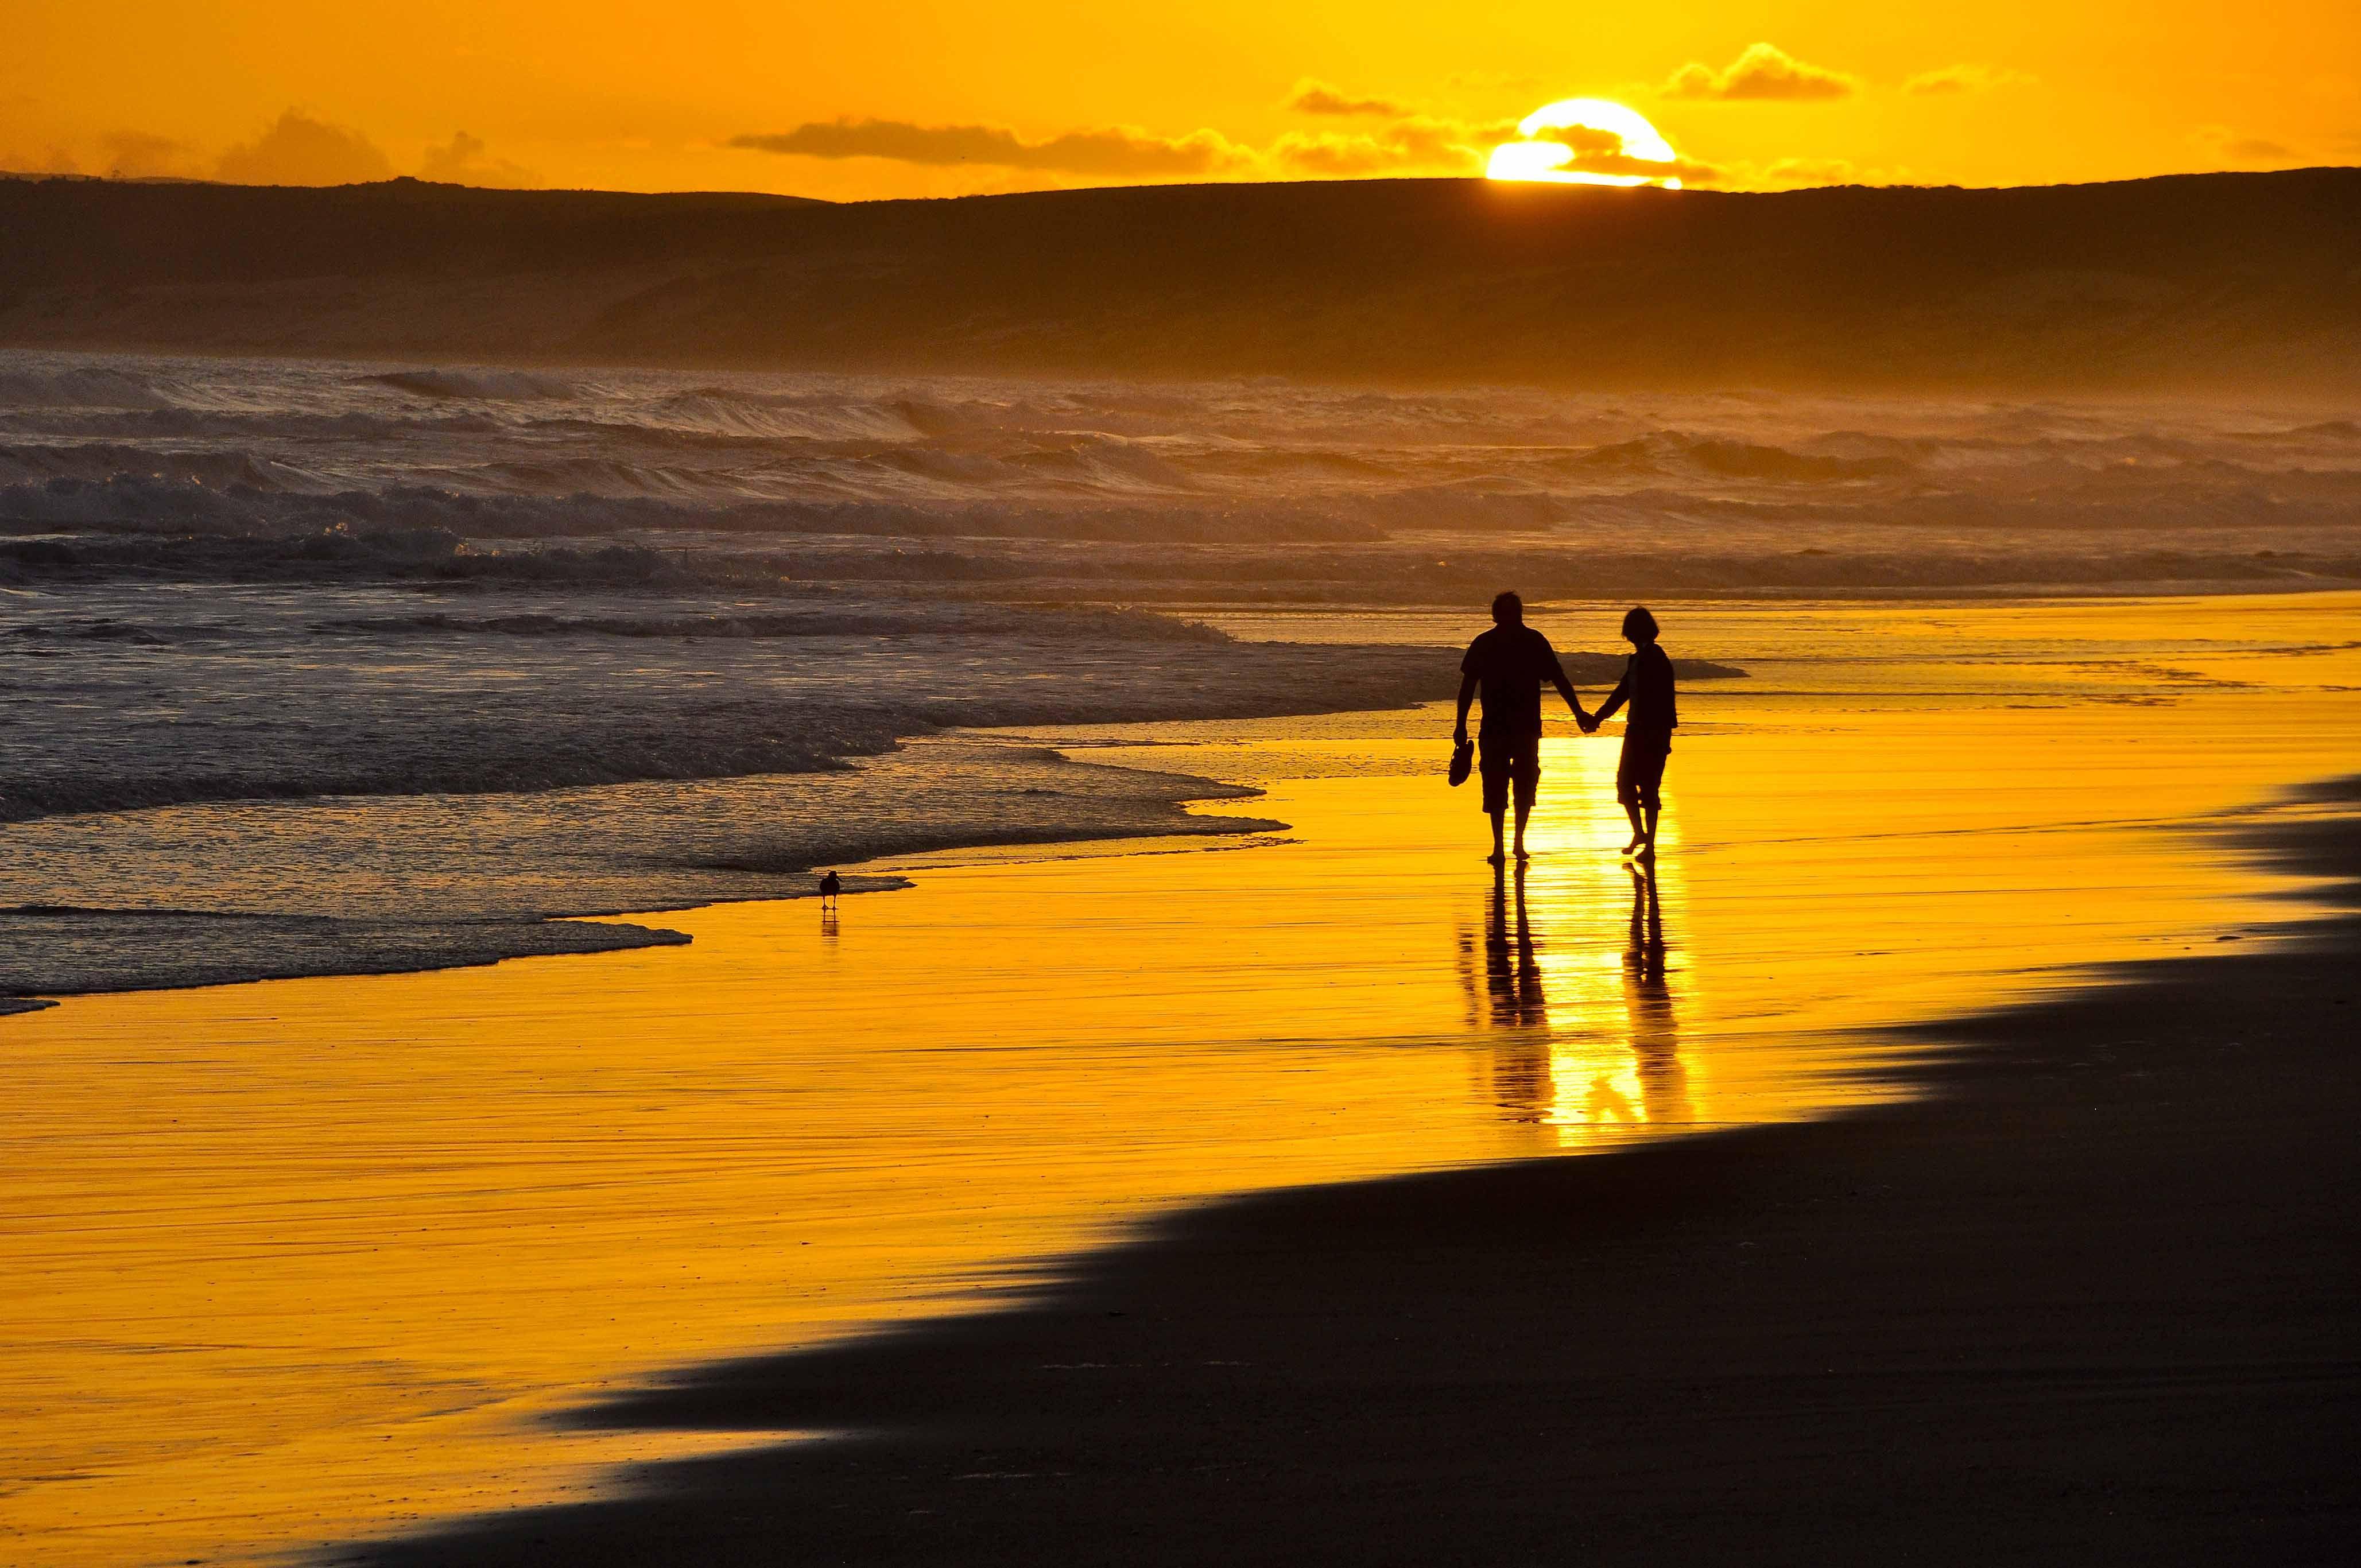 Kavella Rannalla Beach Sunset Wallpaper Romantic Sunset Beach Pictures Friends Couple walk in beach love wallpapers hd